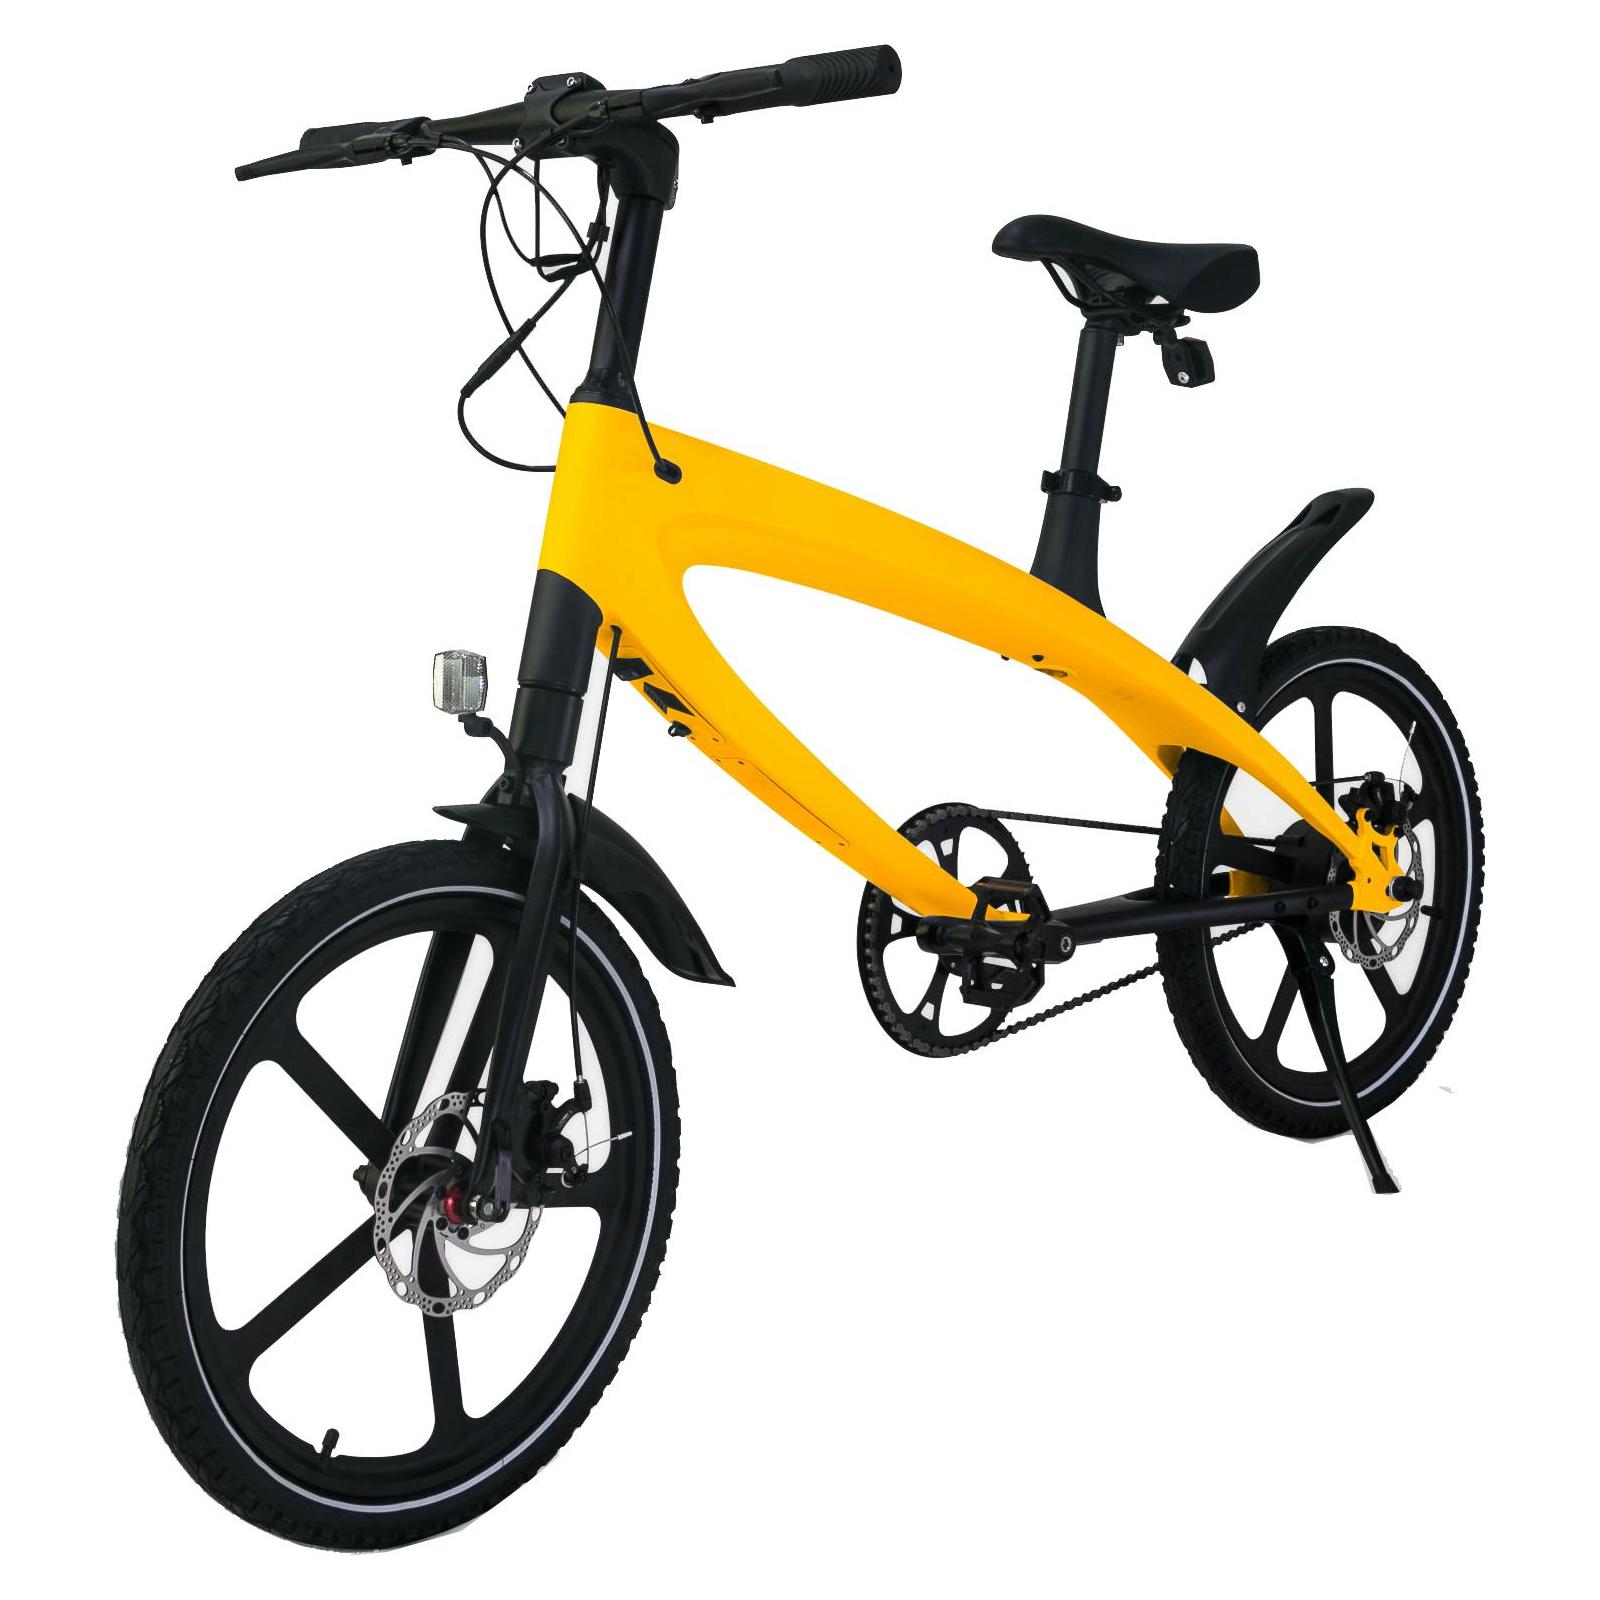 Электровелосипед Rover S1 Orange (347123) изображение 3